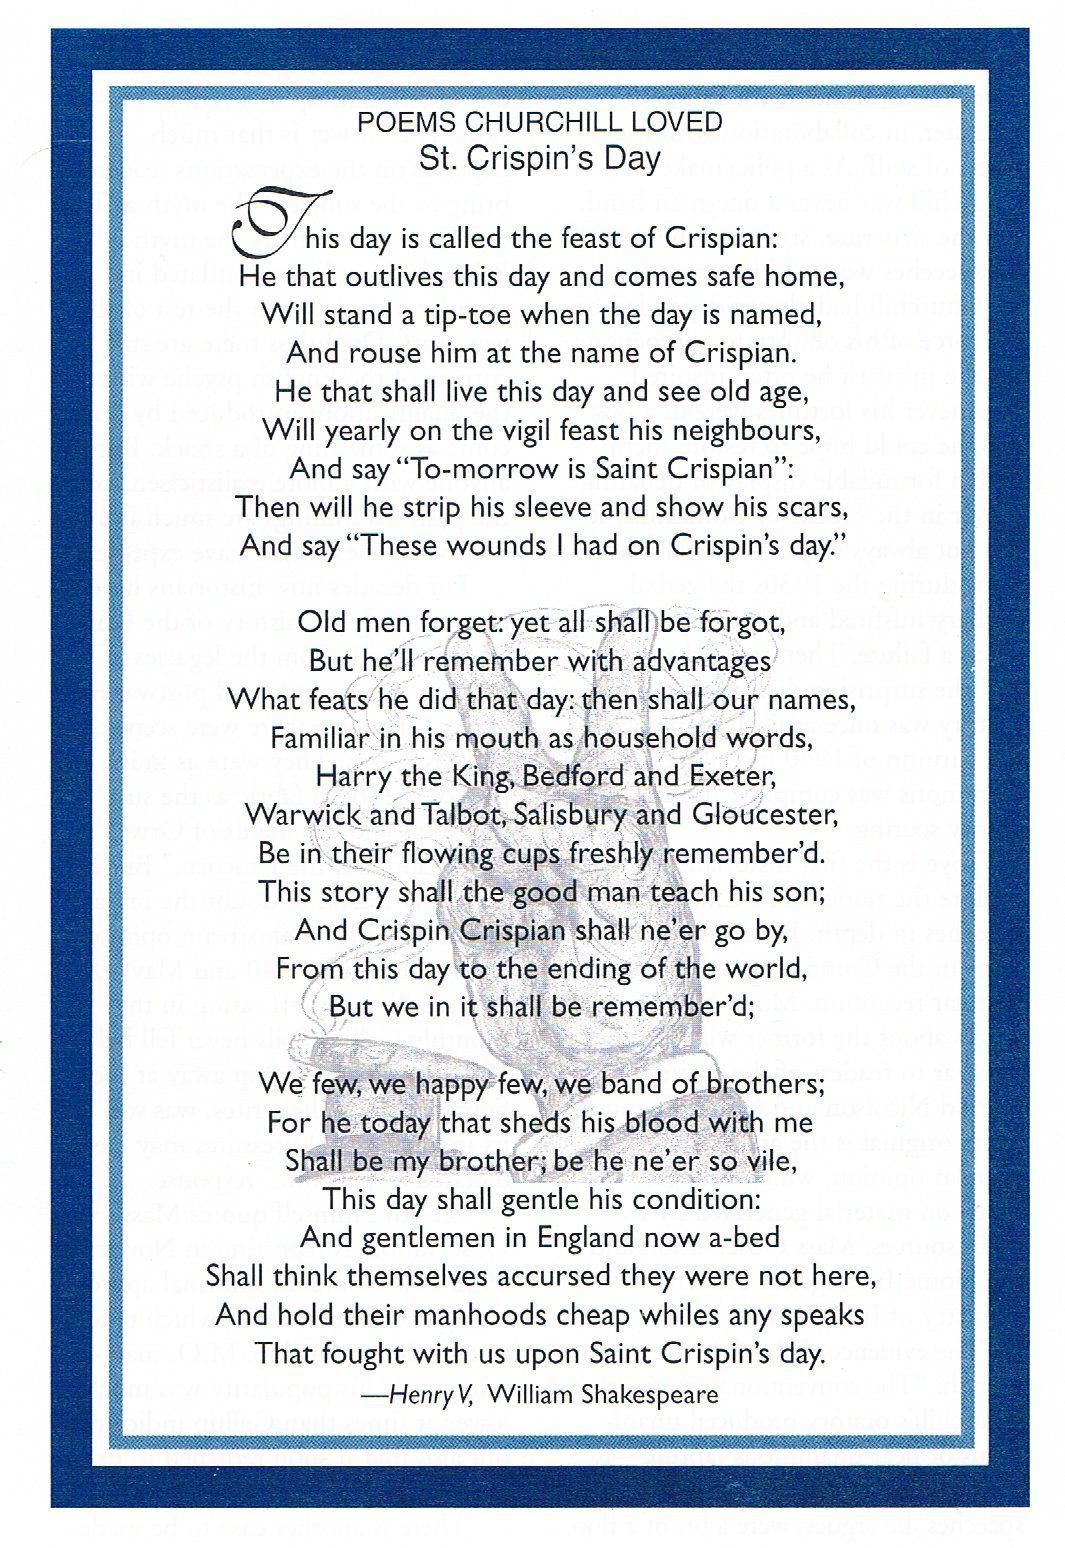 St Crispin's Day Speech